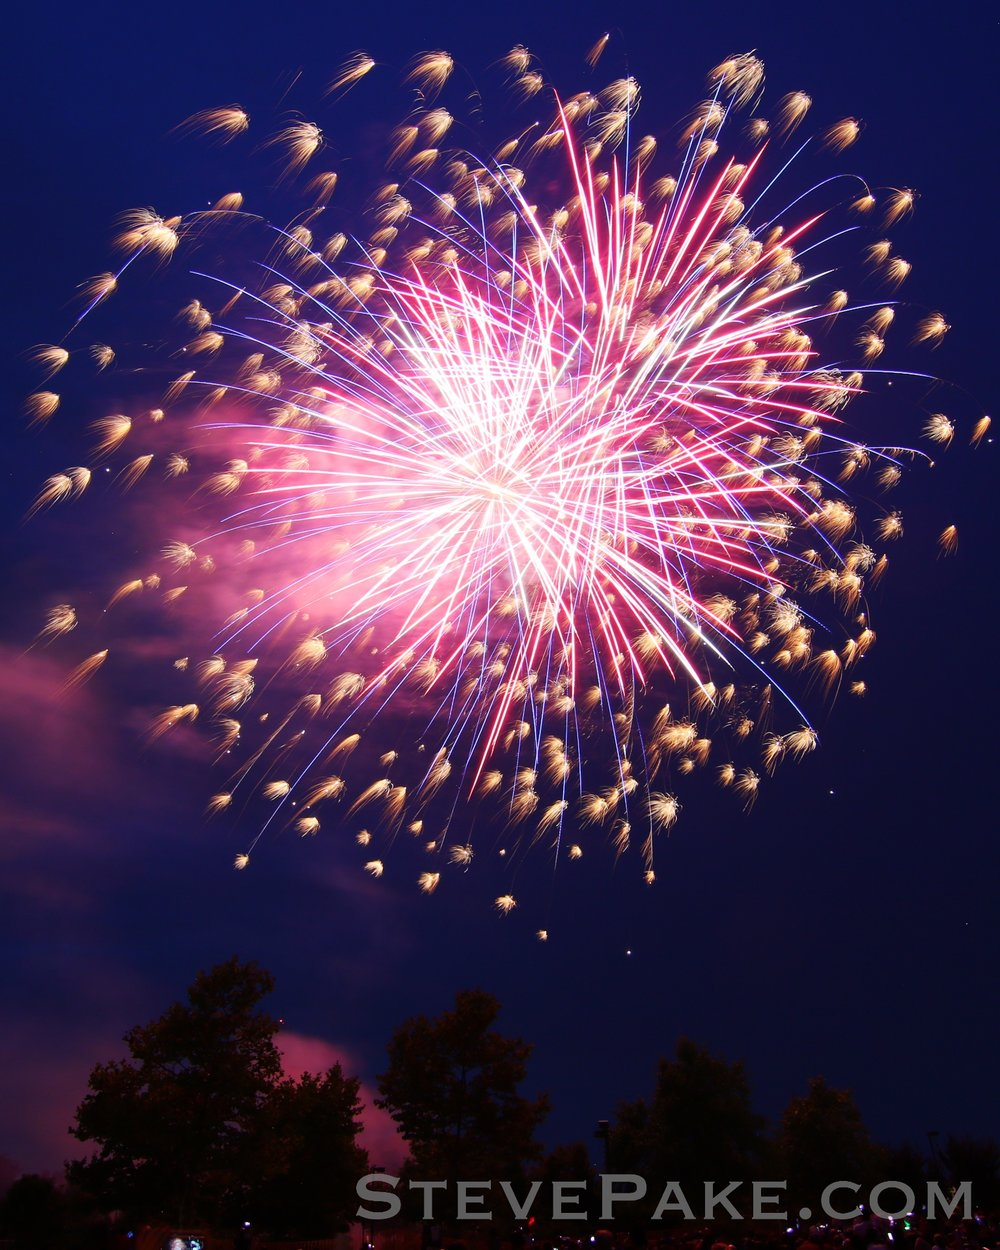 Fireworks2018_12_GE3A8511ap-HD-WM.jpg